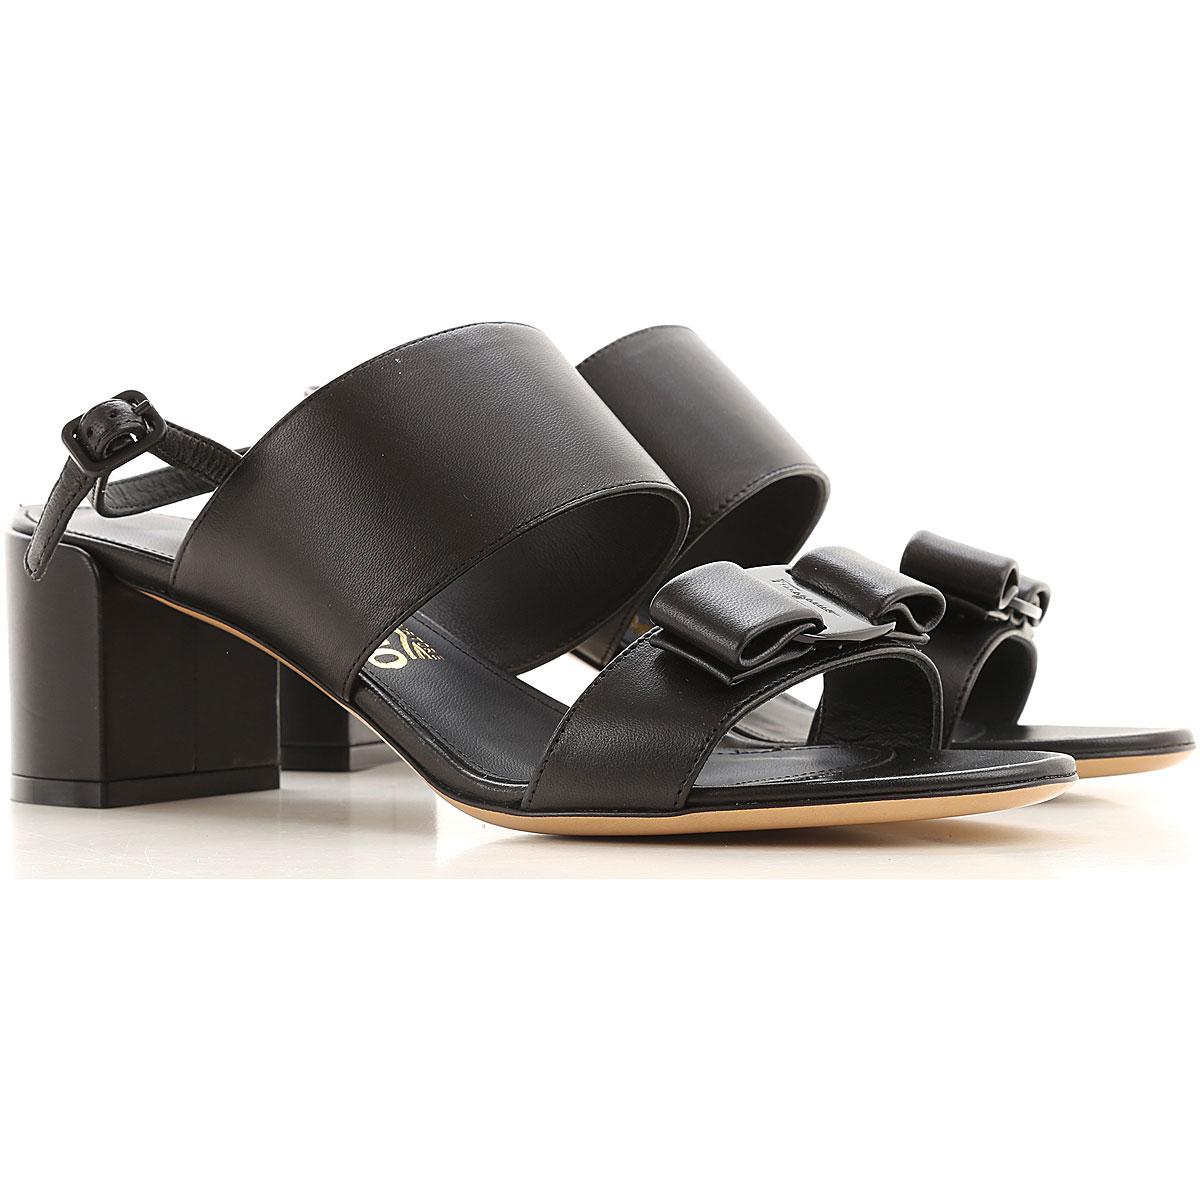 Salvatore Ferragamo Sandals for Women On Sale, Black, Leather, 2019, 8.5 9.5